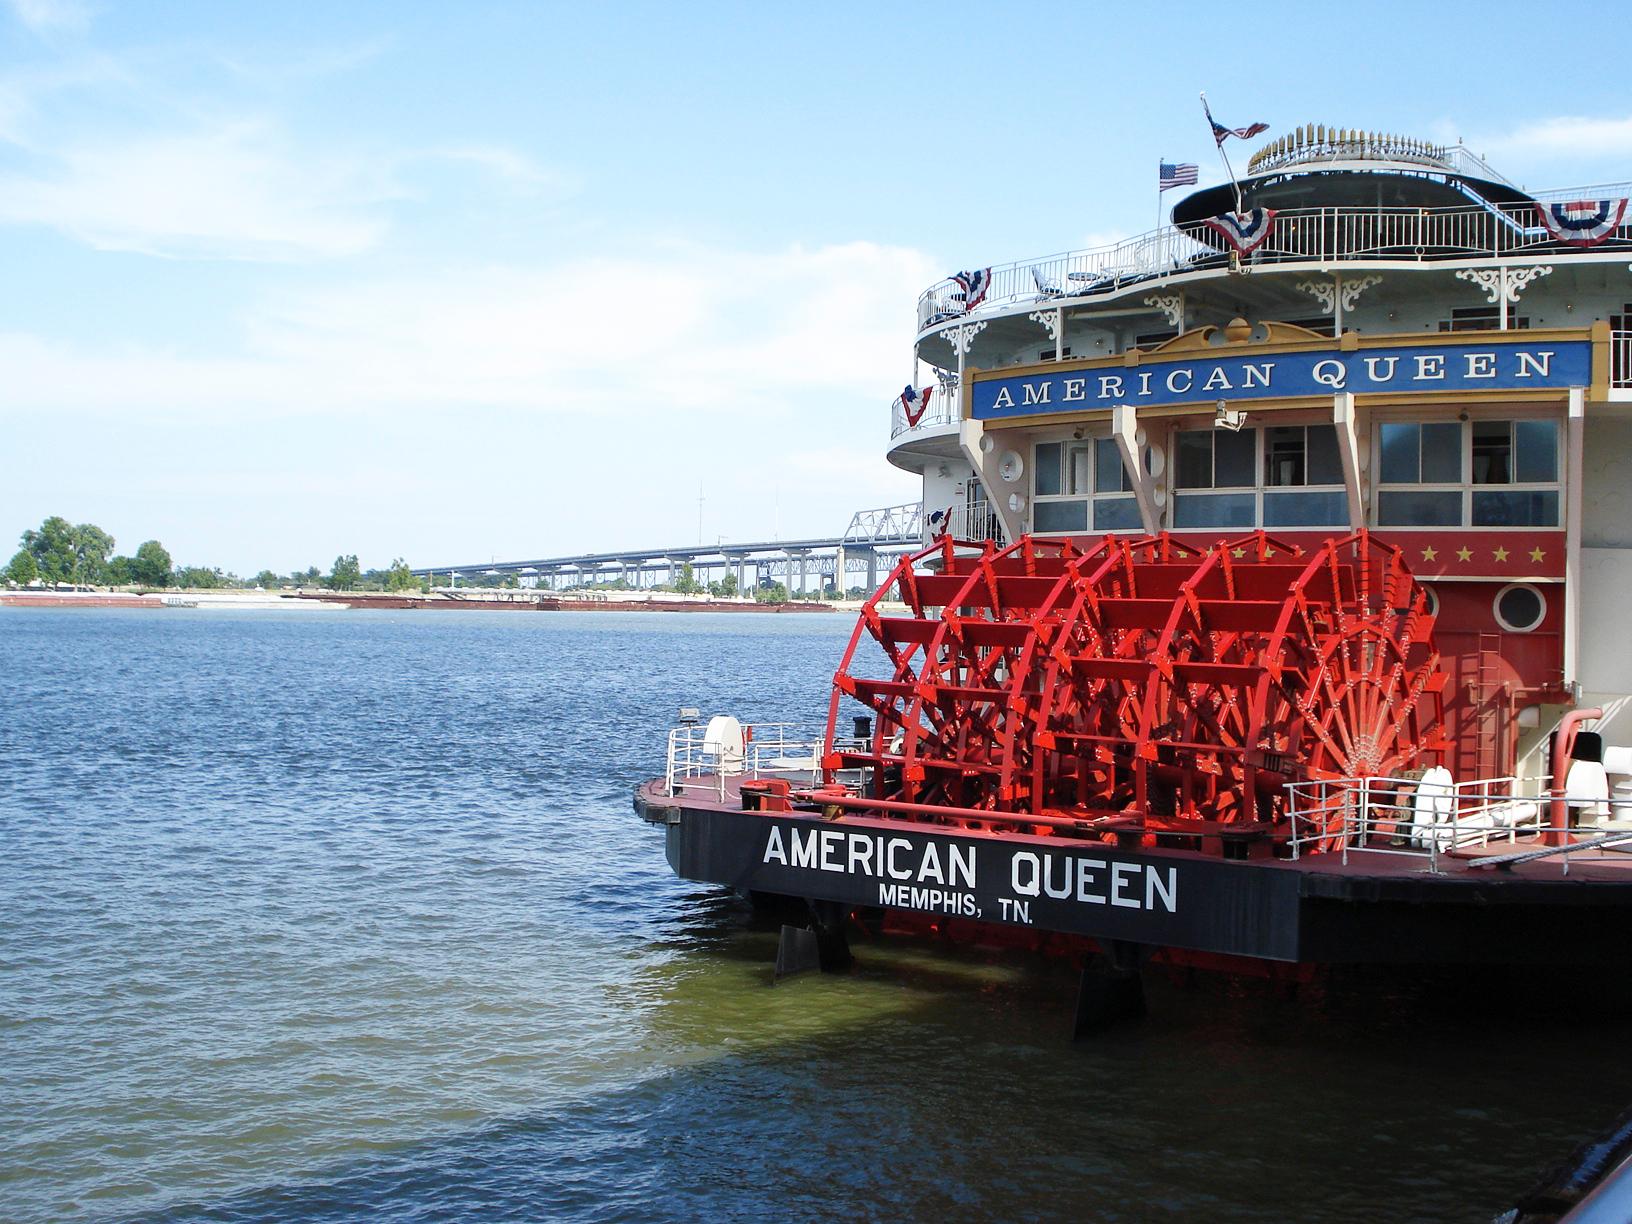 American Queen Steamboat Company American Queen Exterior Rear Shot.jpg